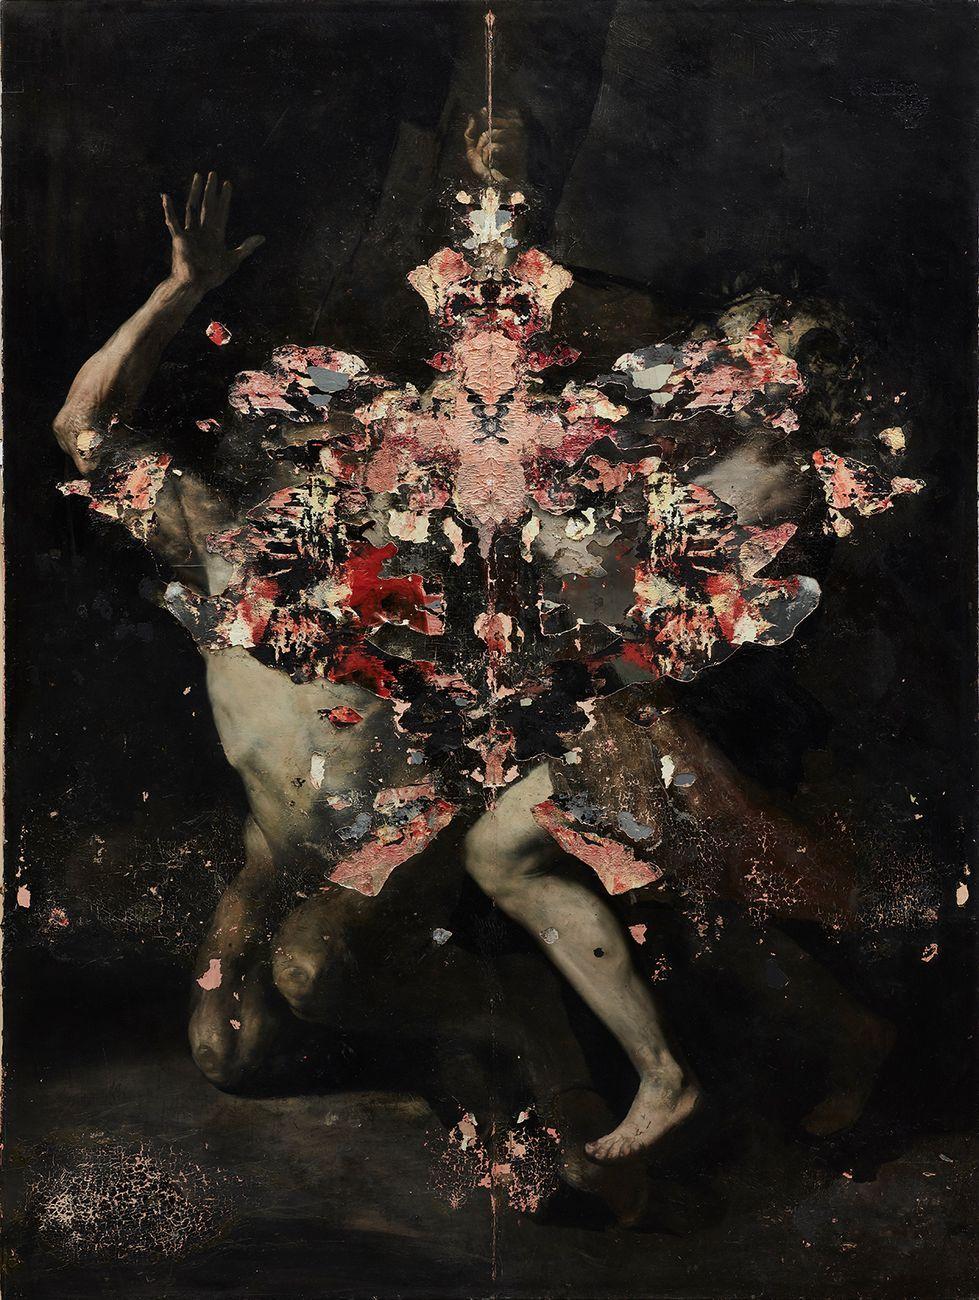 Nicola Samorì, Emanto, 2016. Courtesy EIGEN+ART, Berlino Lipsia